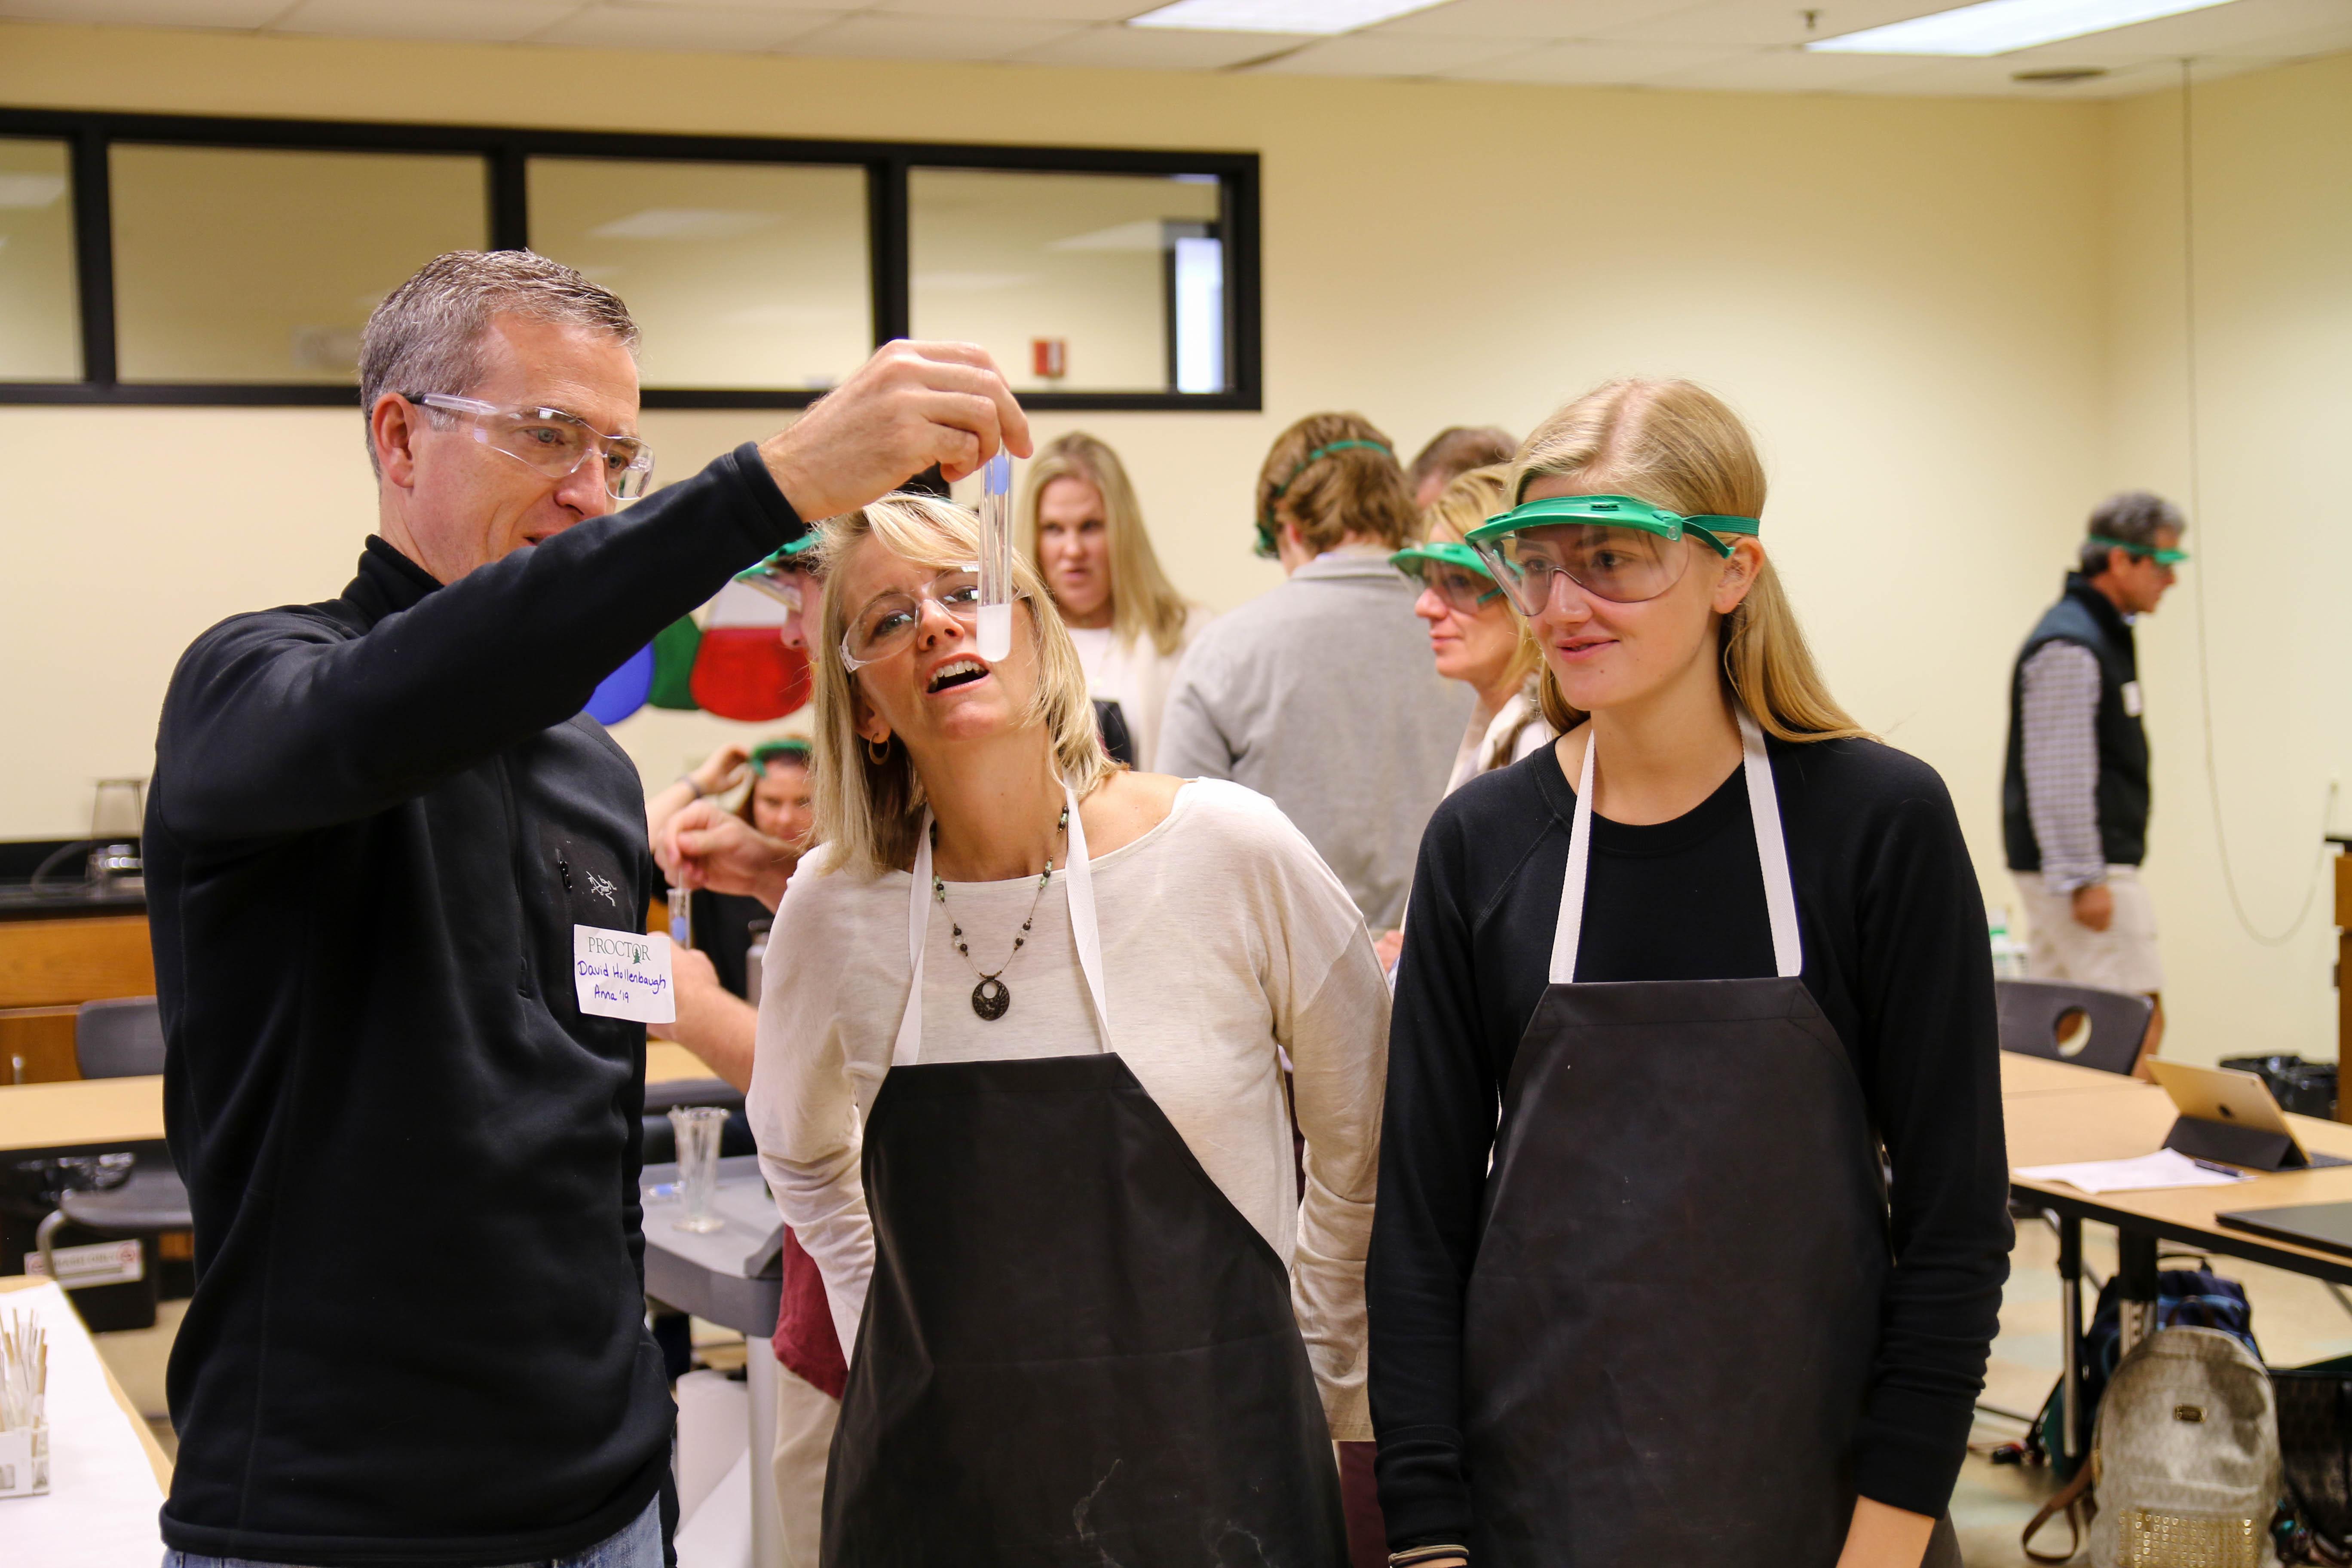 Proctor Academy New England boading school experiential education